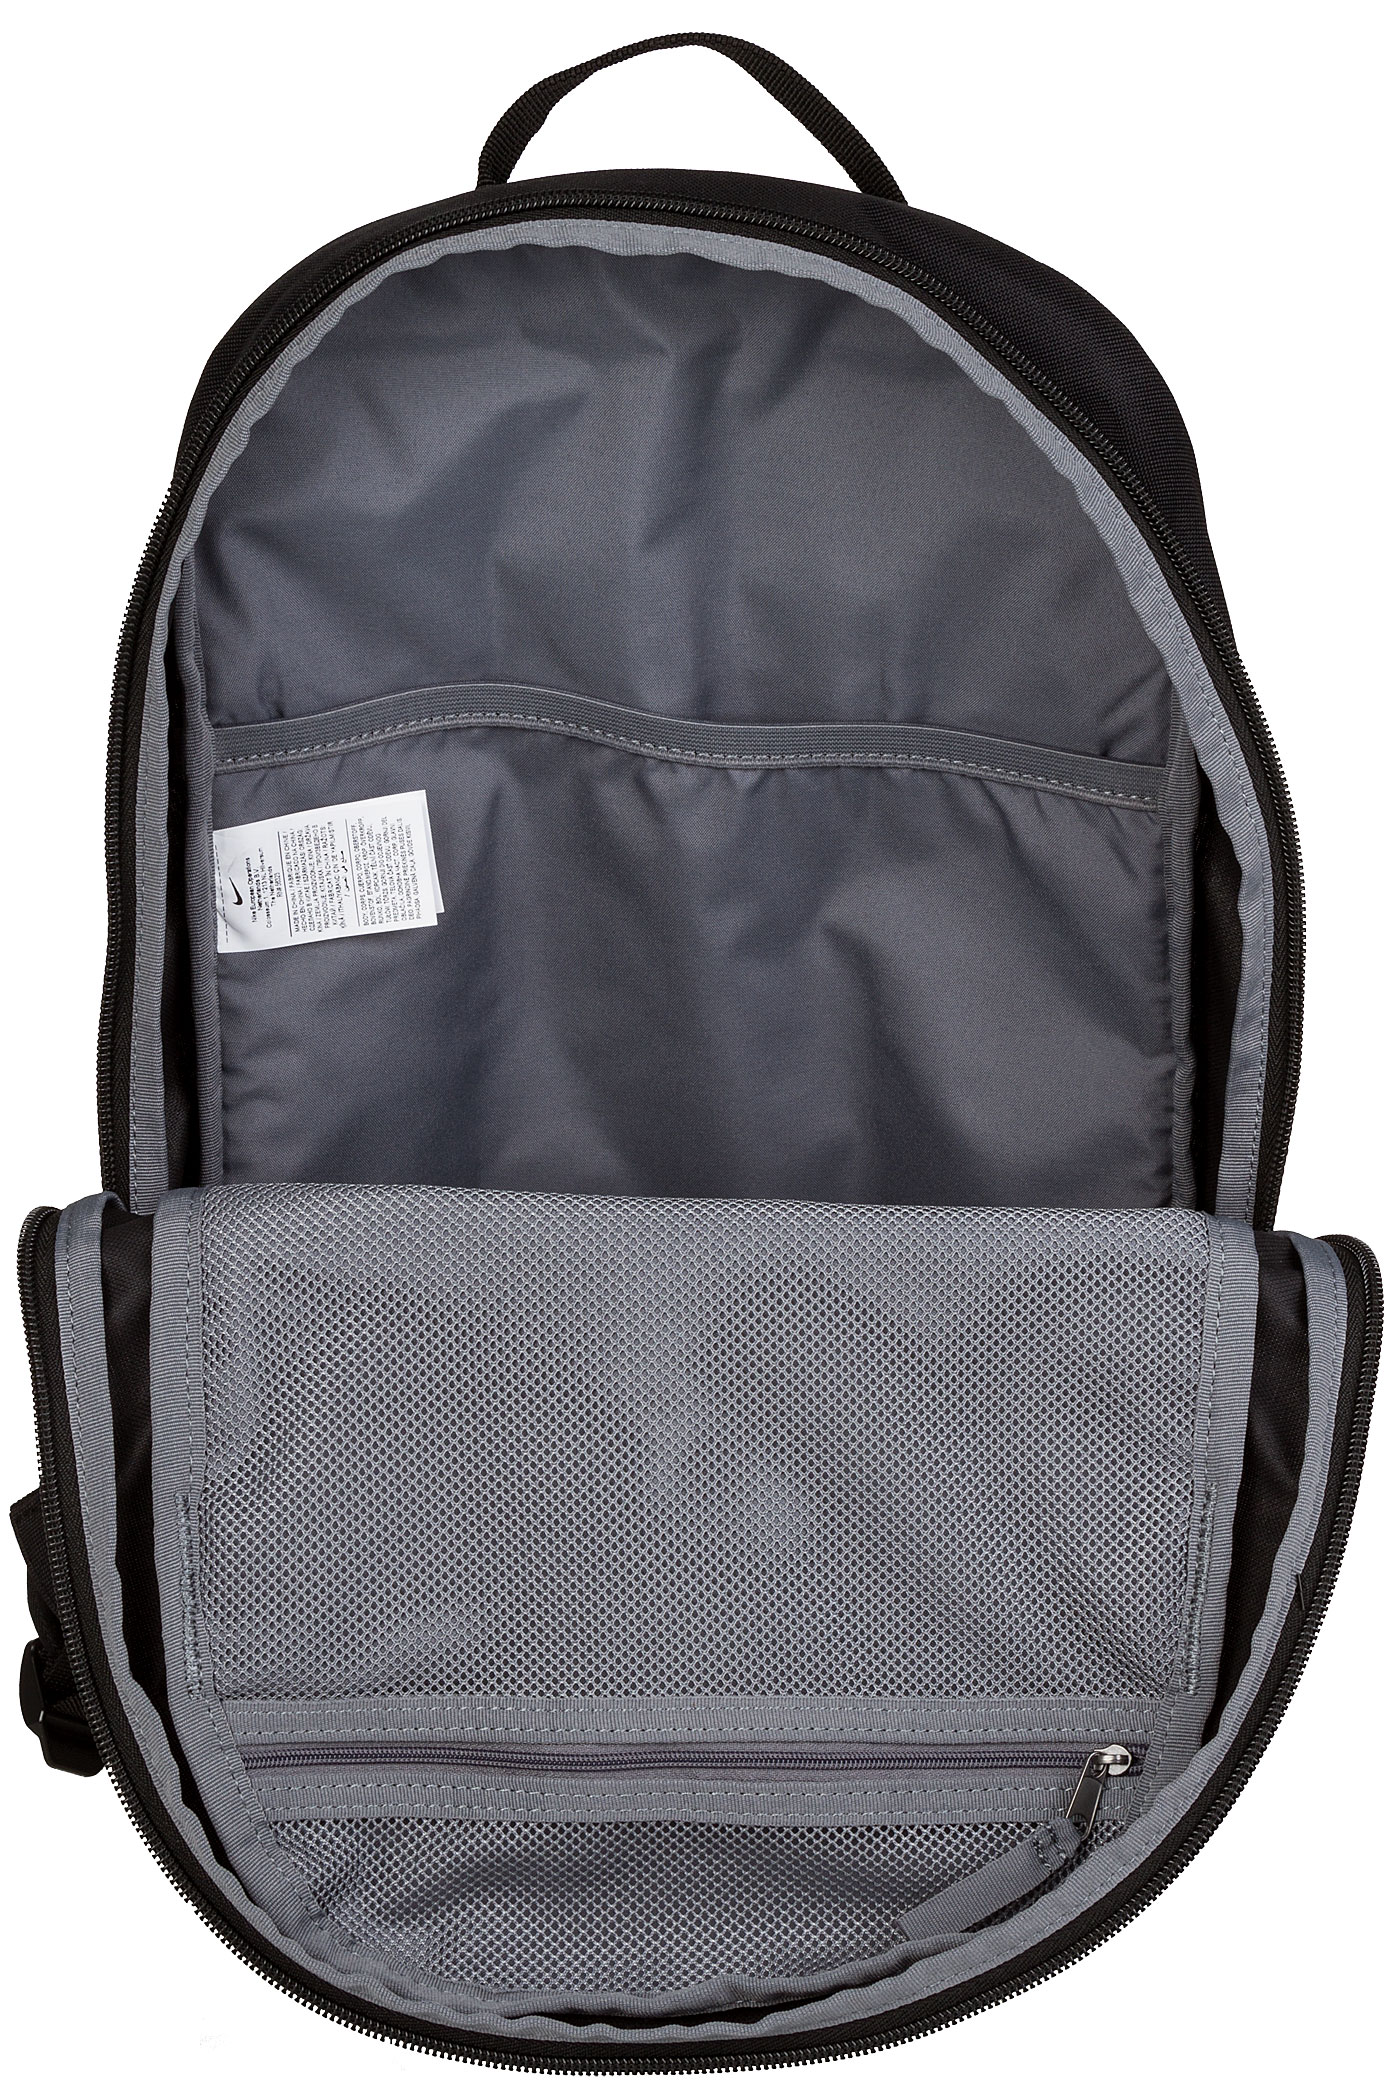 Buy nike galaxy backpack   OFF53% Discounted 70aa24101c